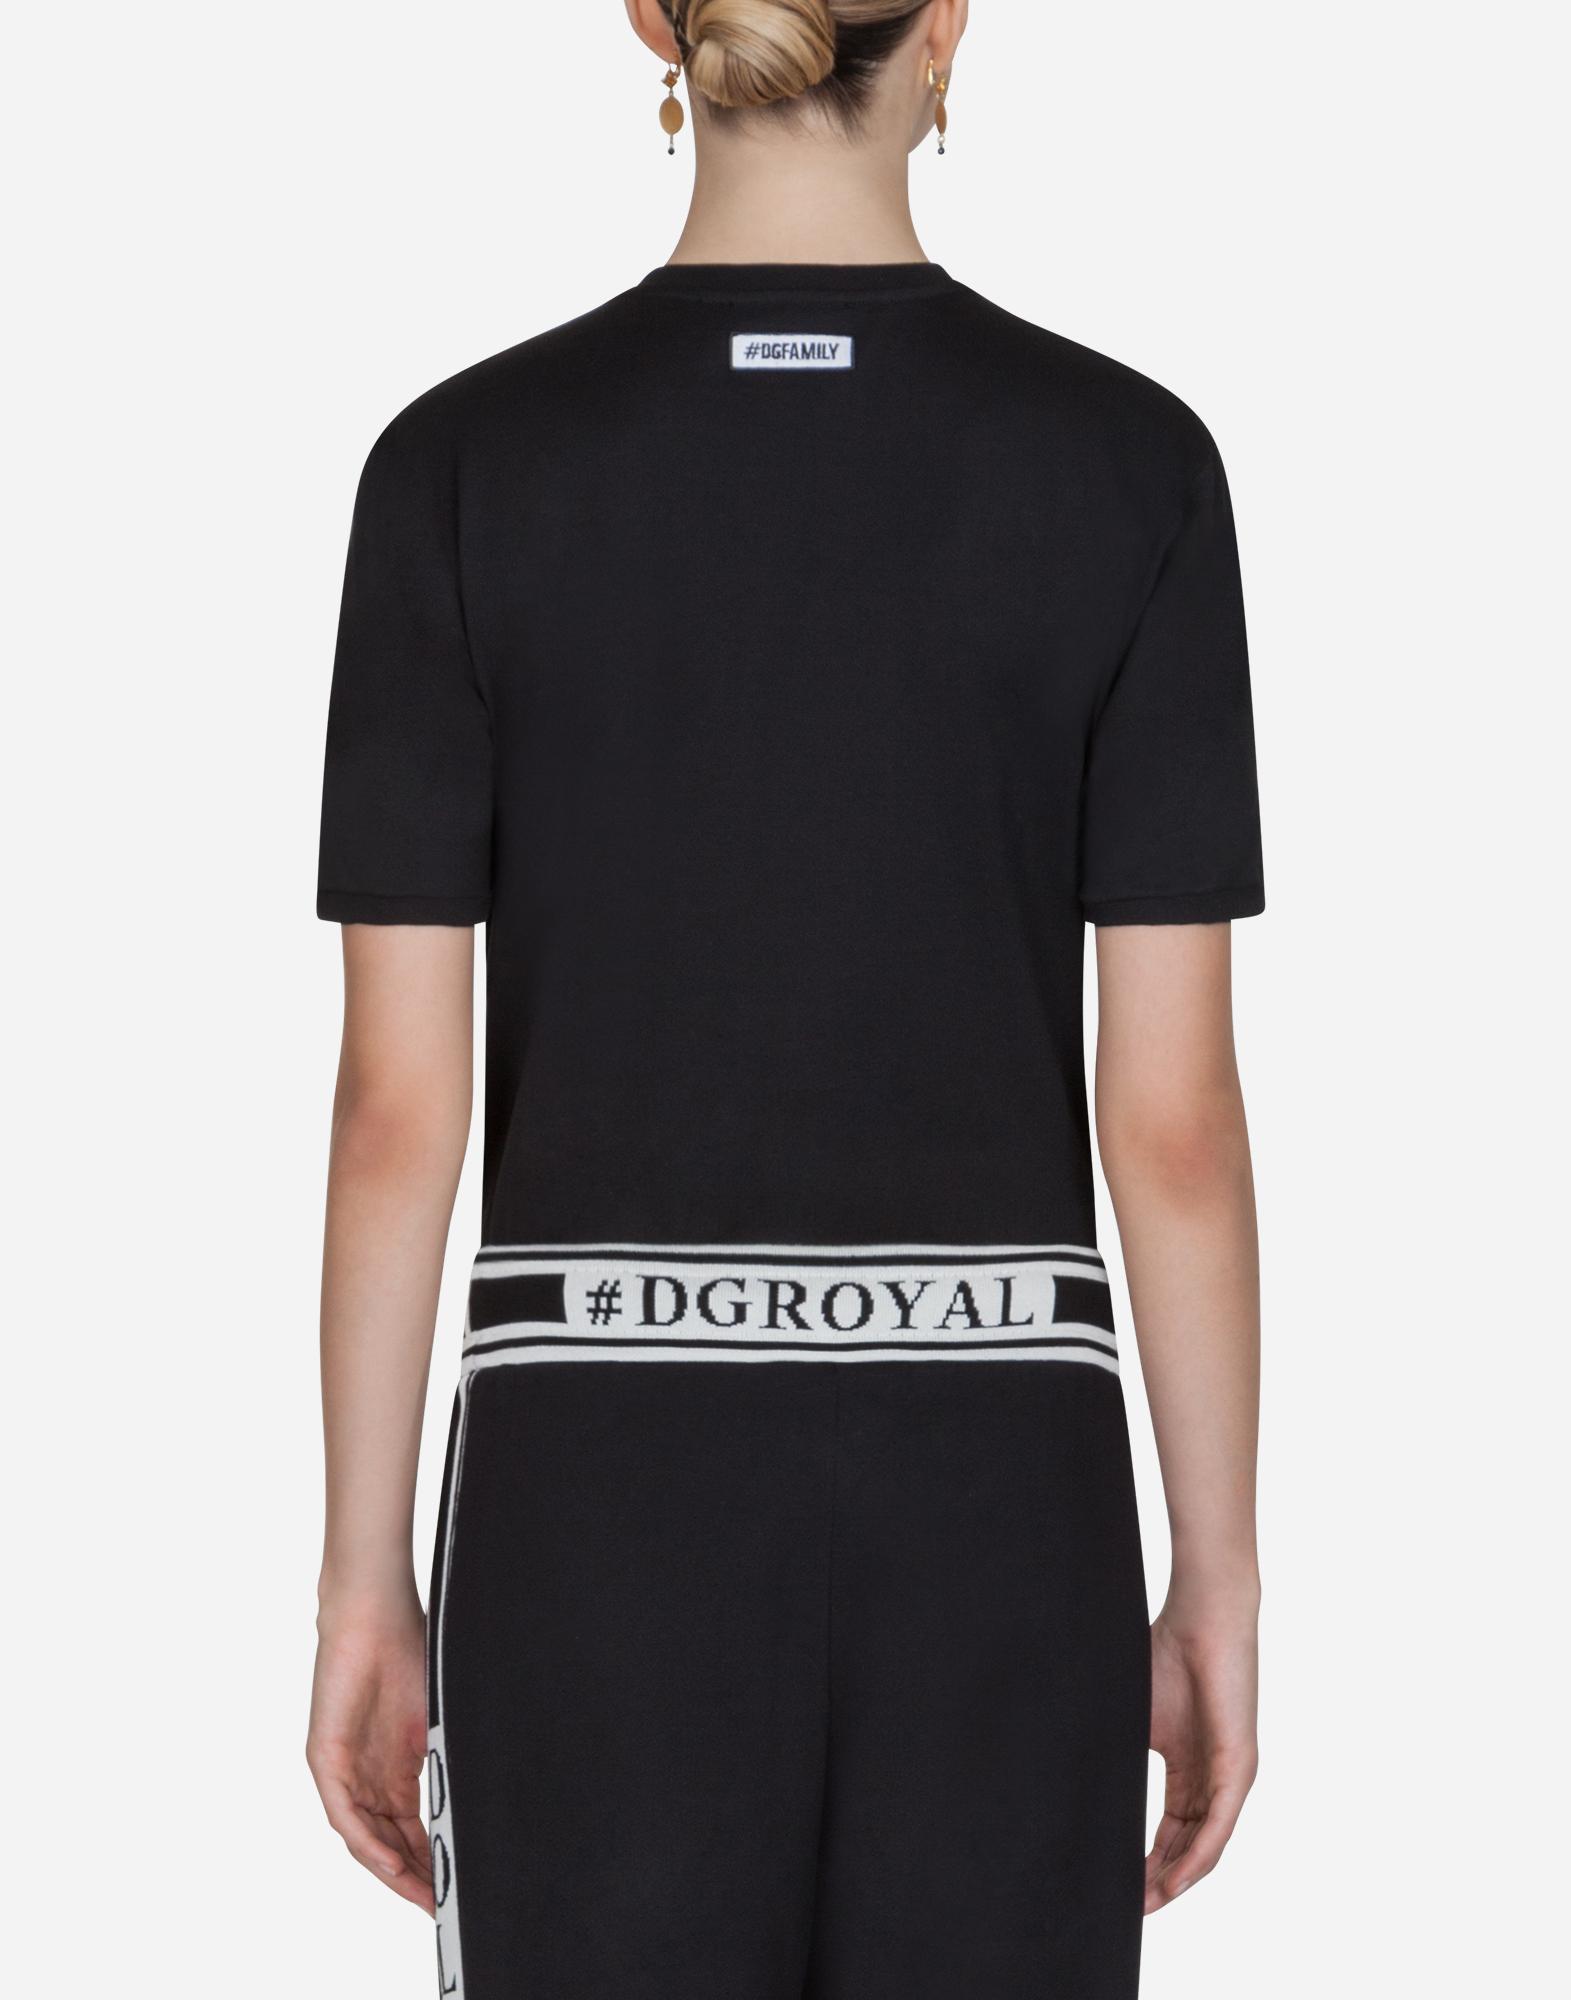 Dolce&Gabbana #DGFAMILY COTTON T-SHIRT